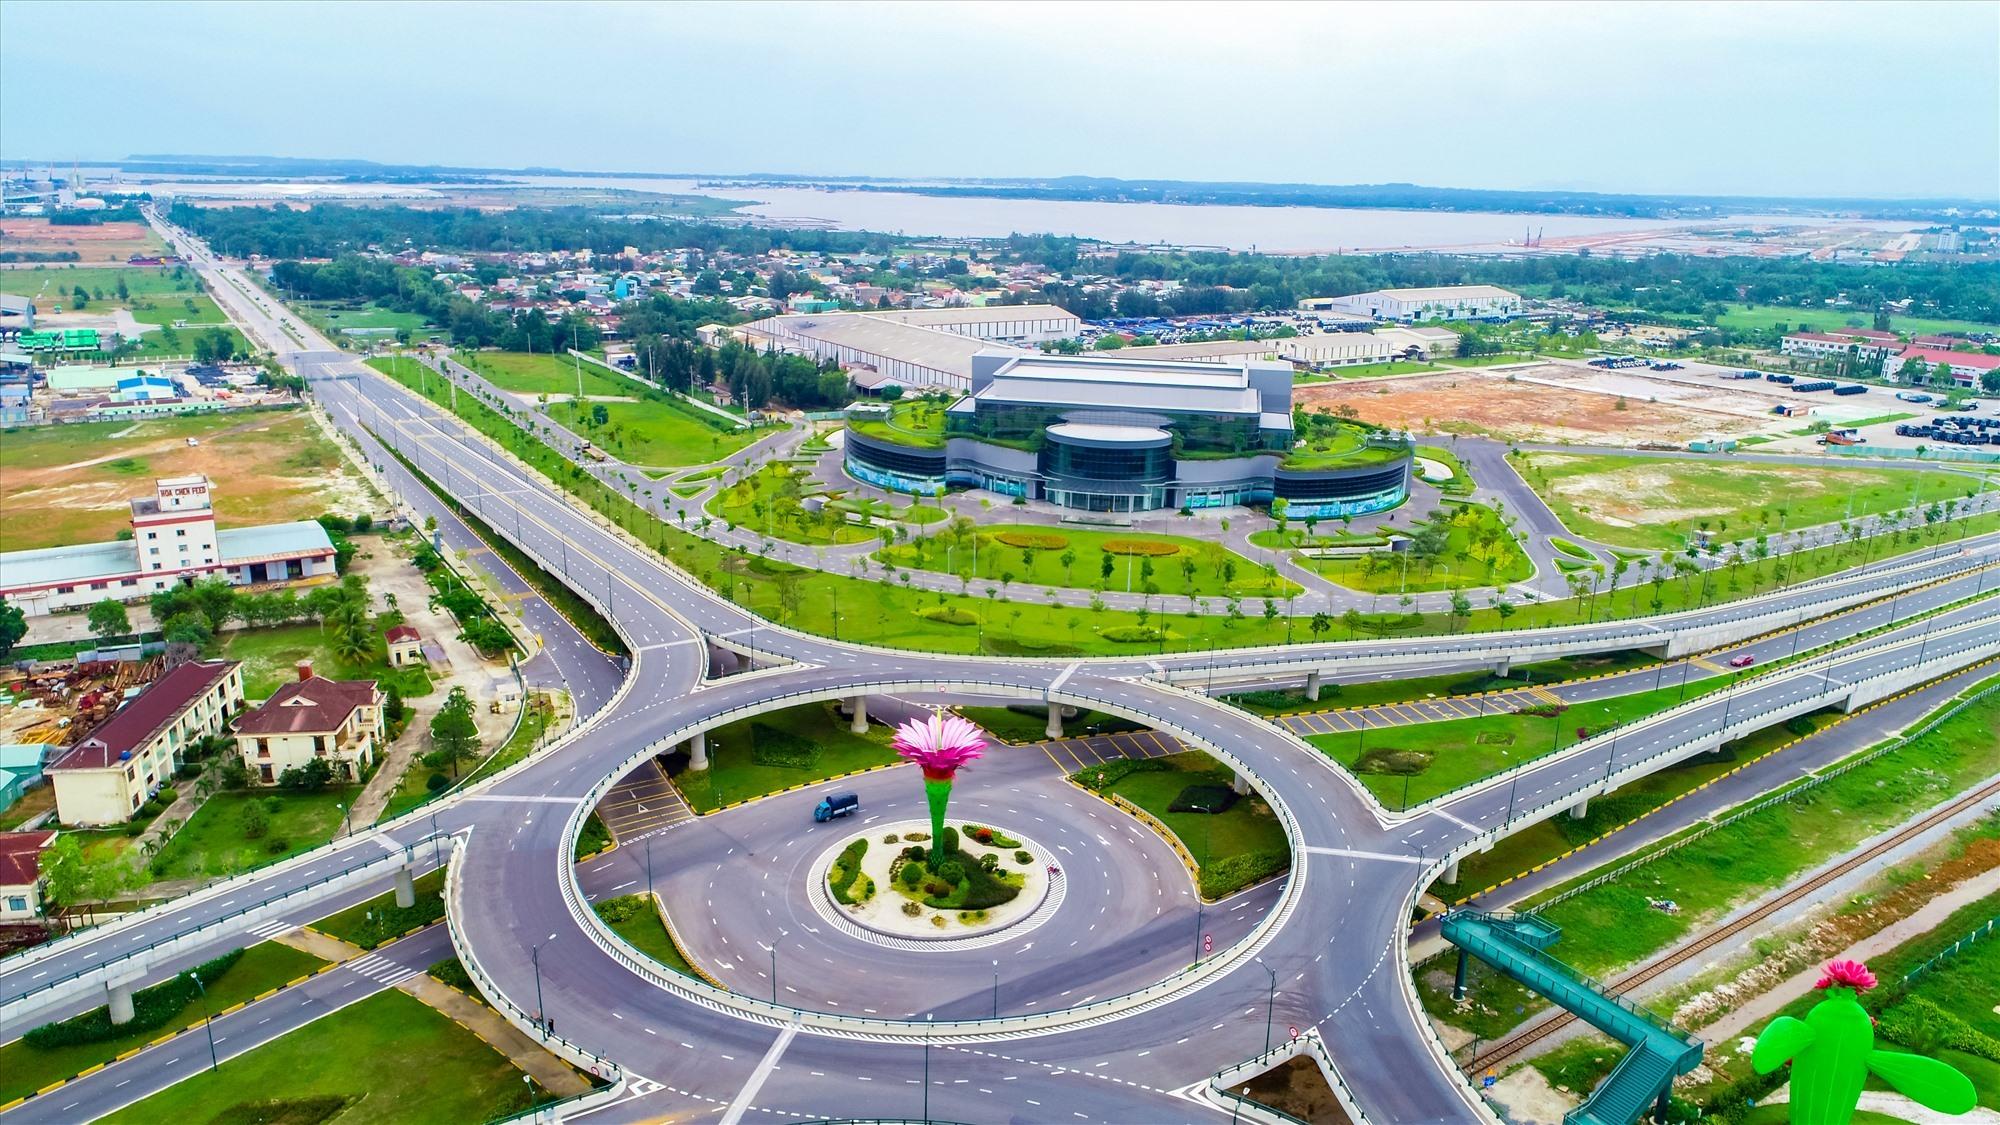 Chu Lai Open Economic Zone, Quang Nam province, Vietnam